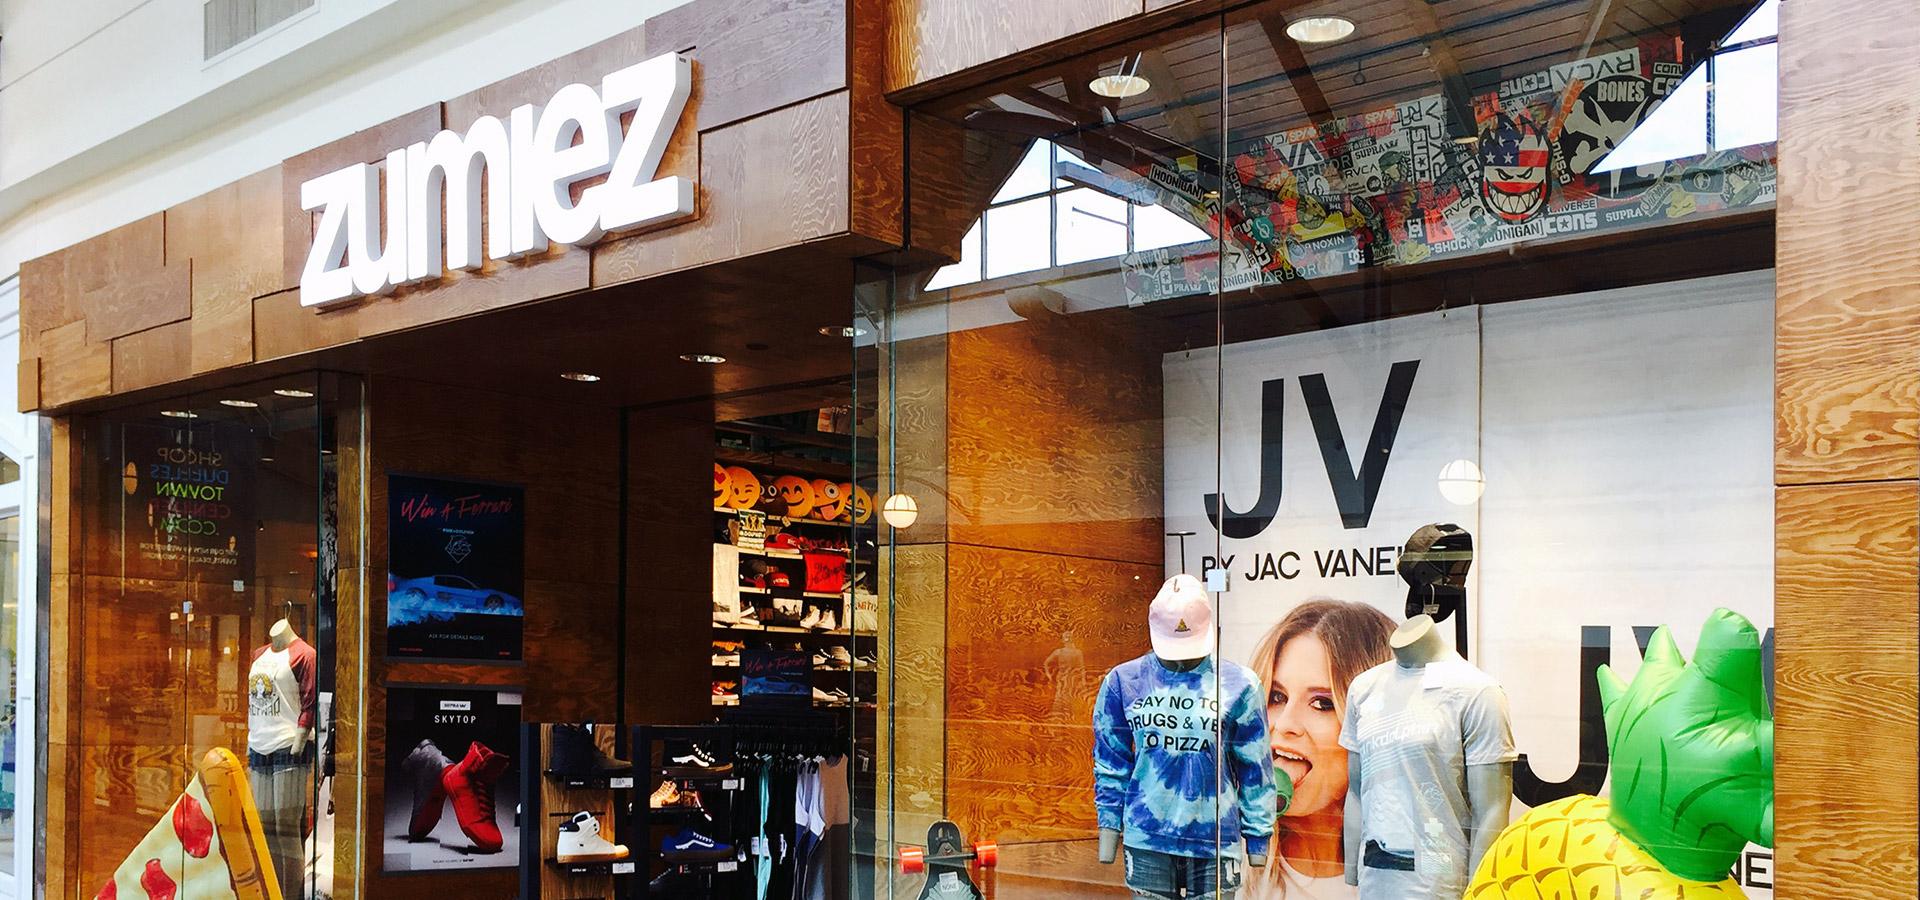 Zumiez Near Me In Dulles, VA | Dulles Town Center on